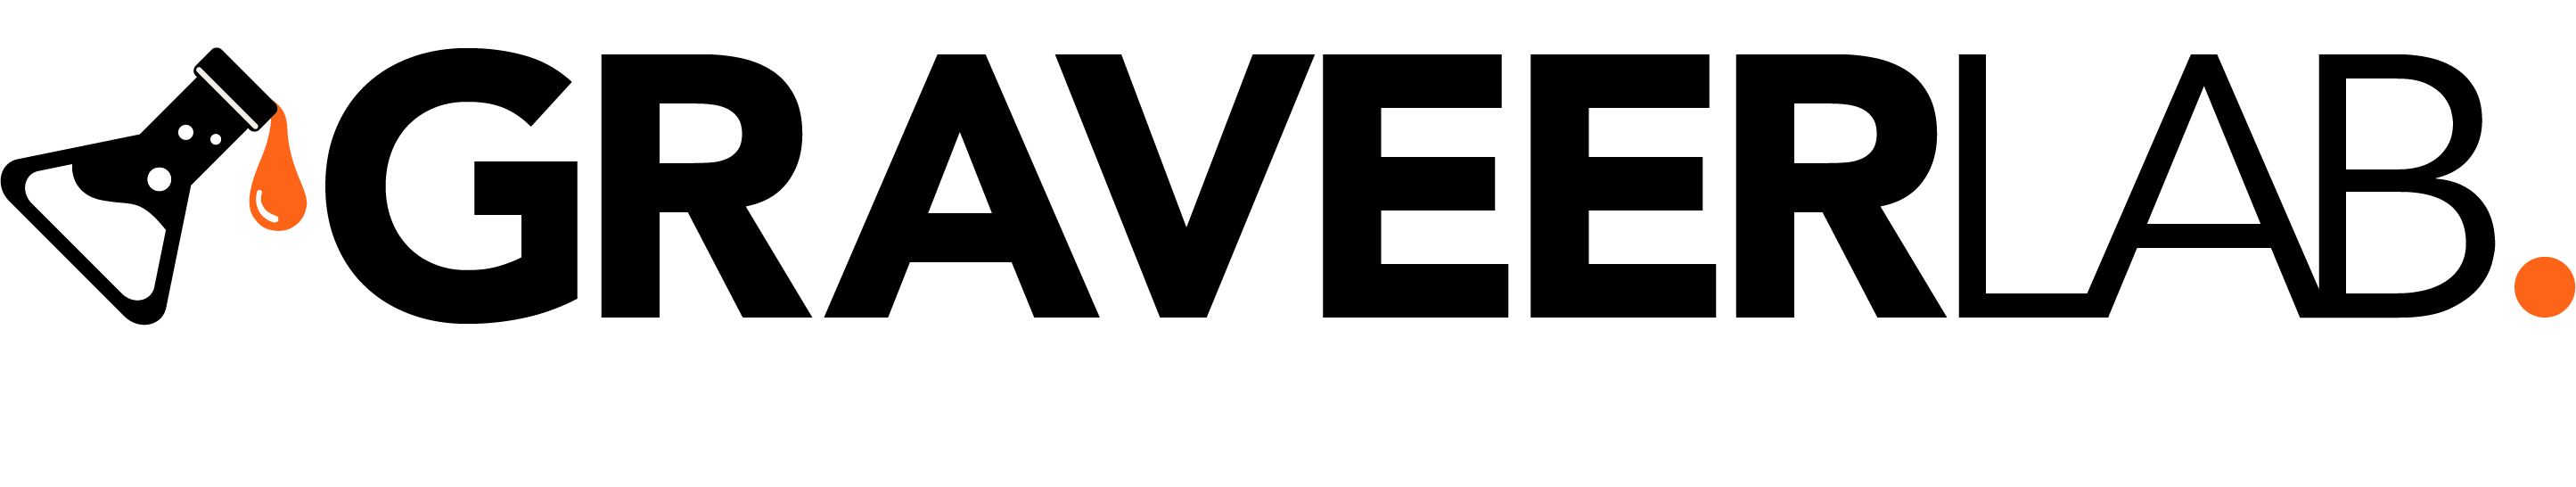 Graveerlab